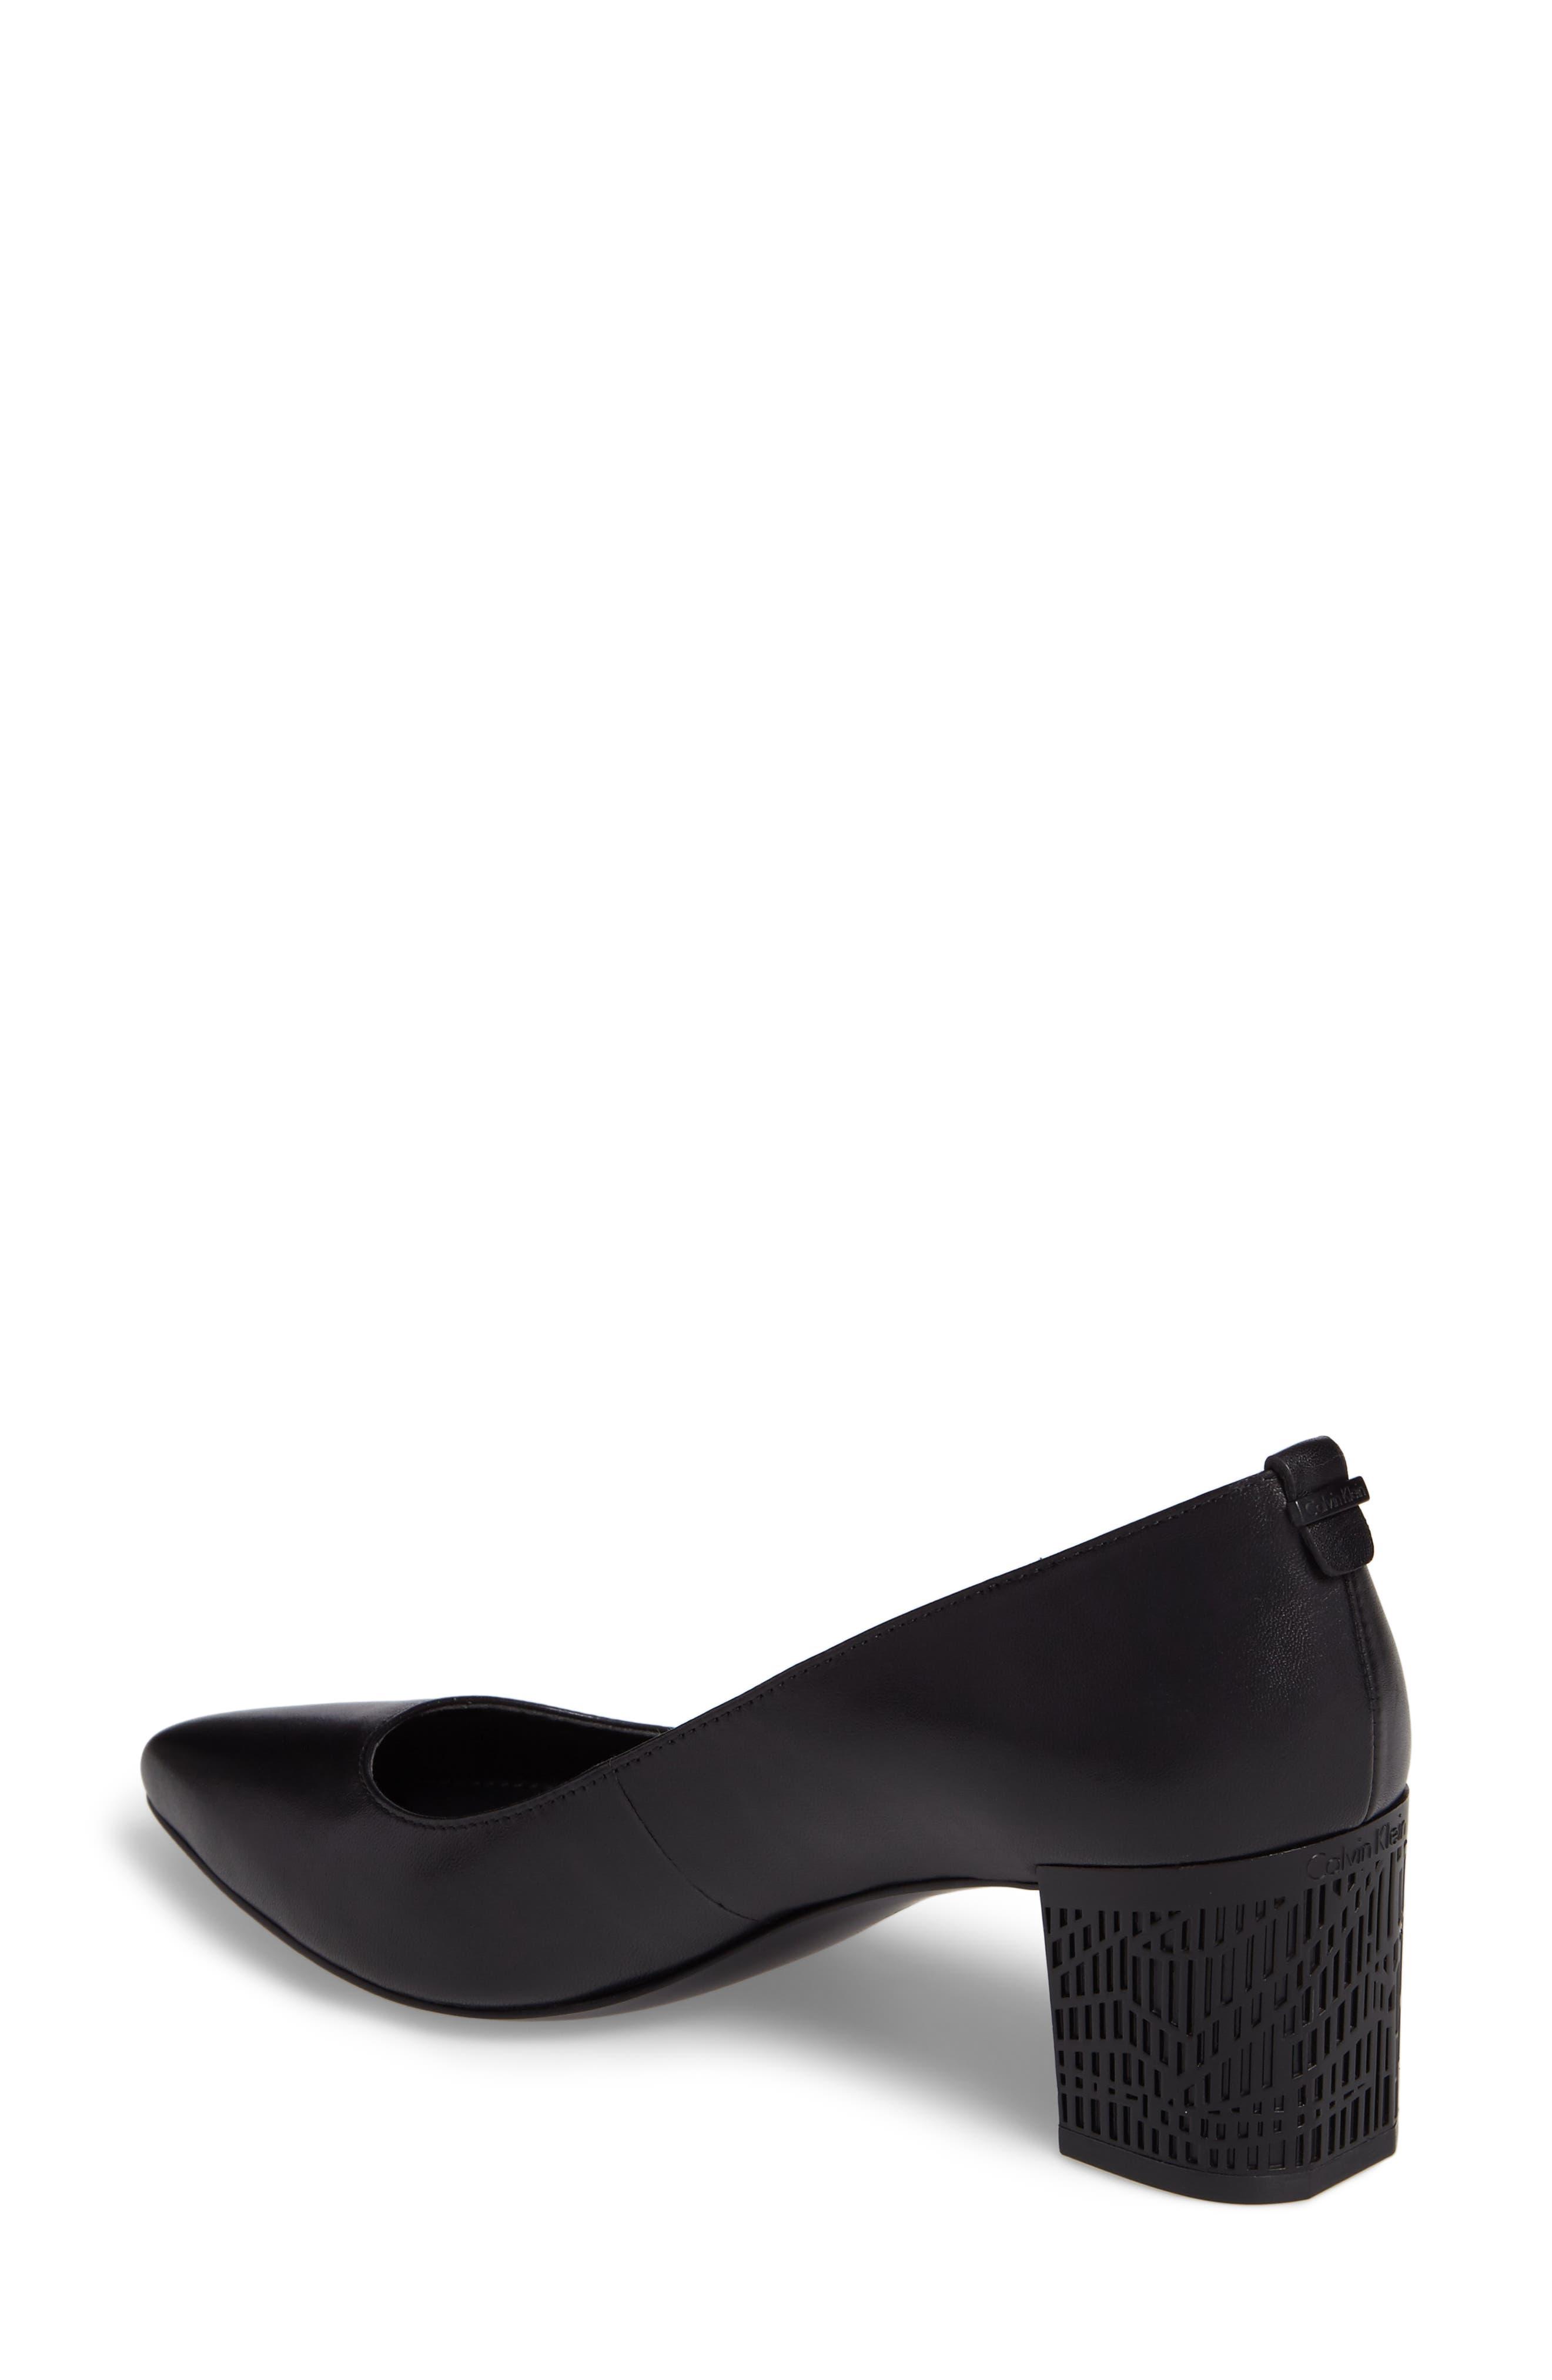 Natalynn 2 Texture Heel Pump,                             Alternate thumbnail 2, color,                             Black